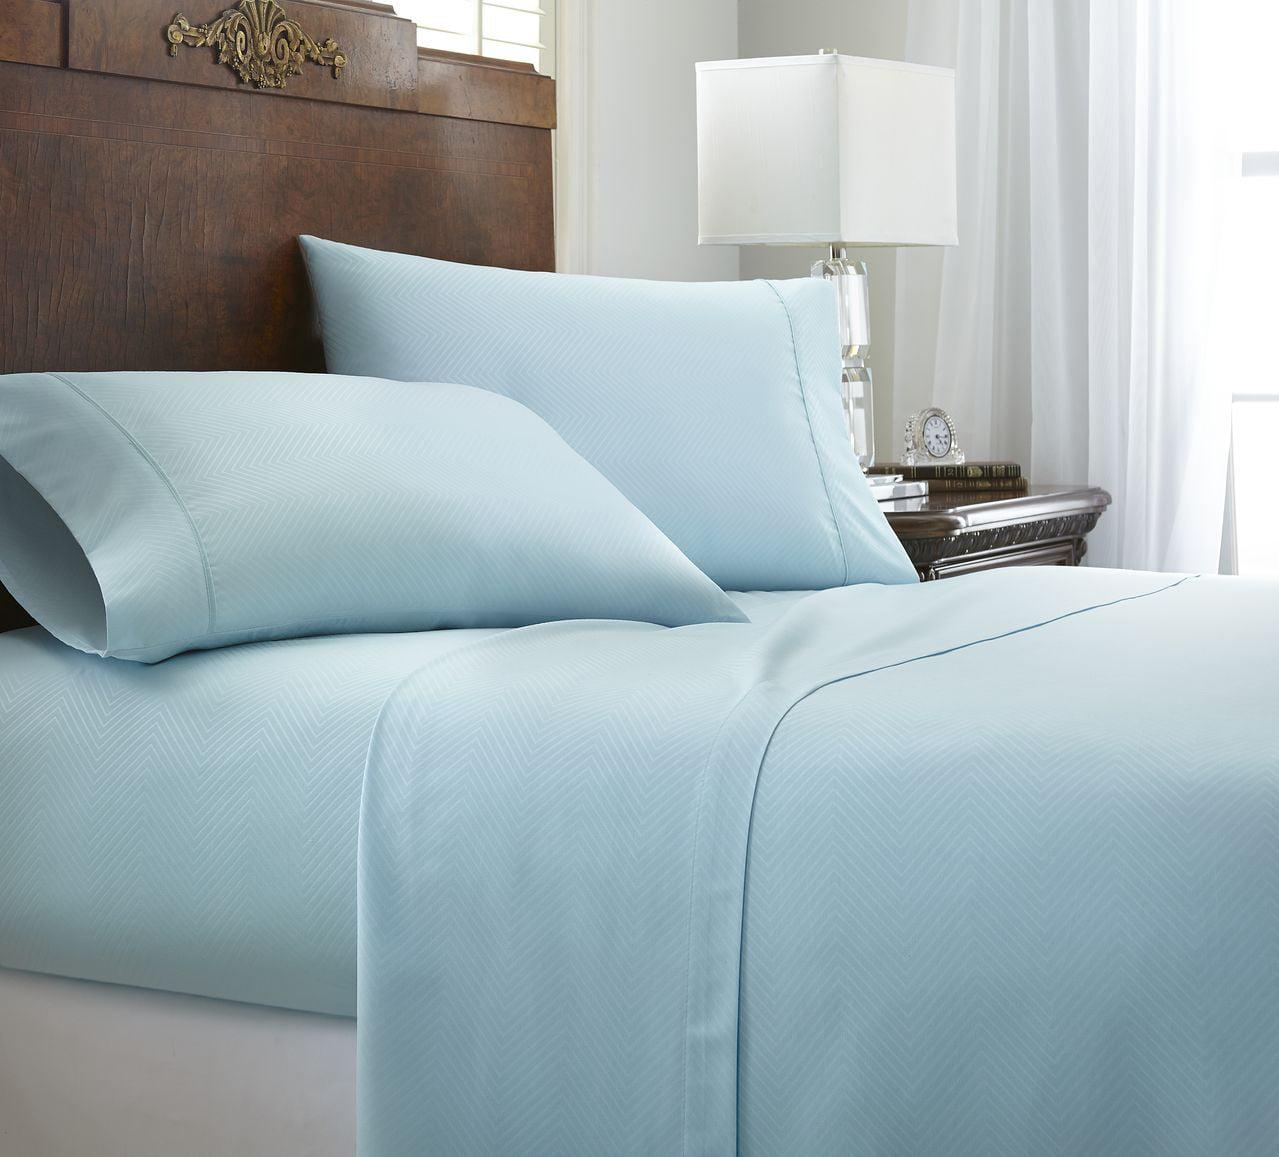 Becky Cameron Ultra Soft Hotel Quality 4 Piece Chevron Bed Sheet Set    California King   Cream   Walmart.com